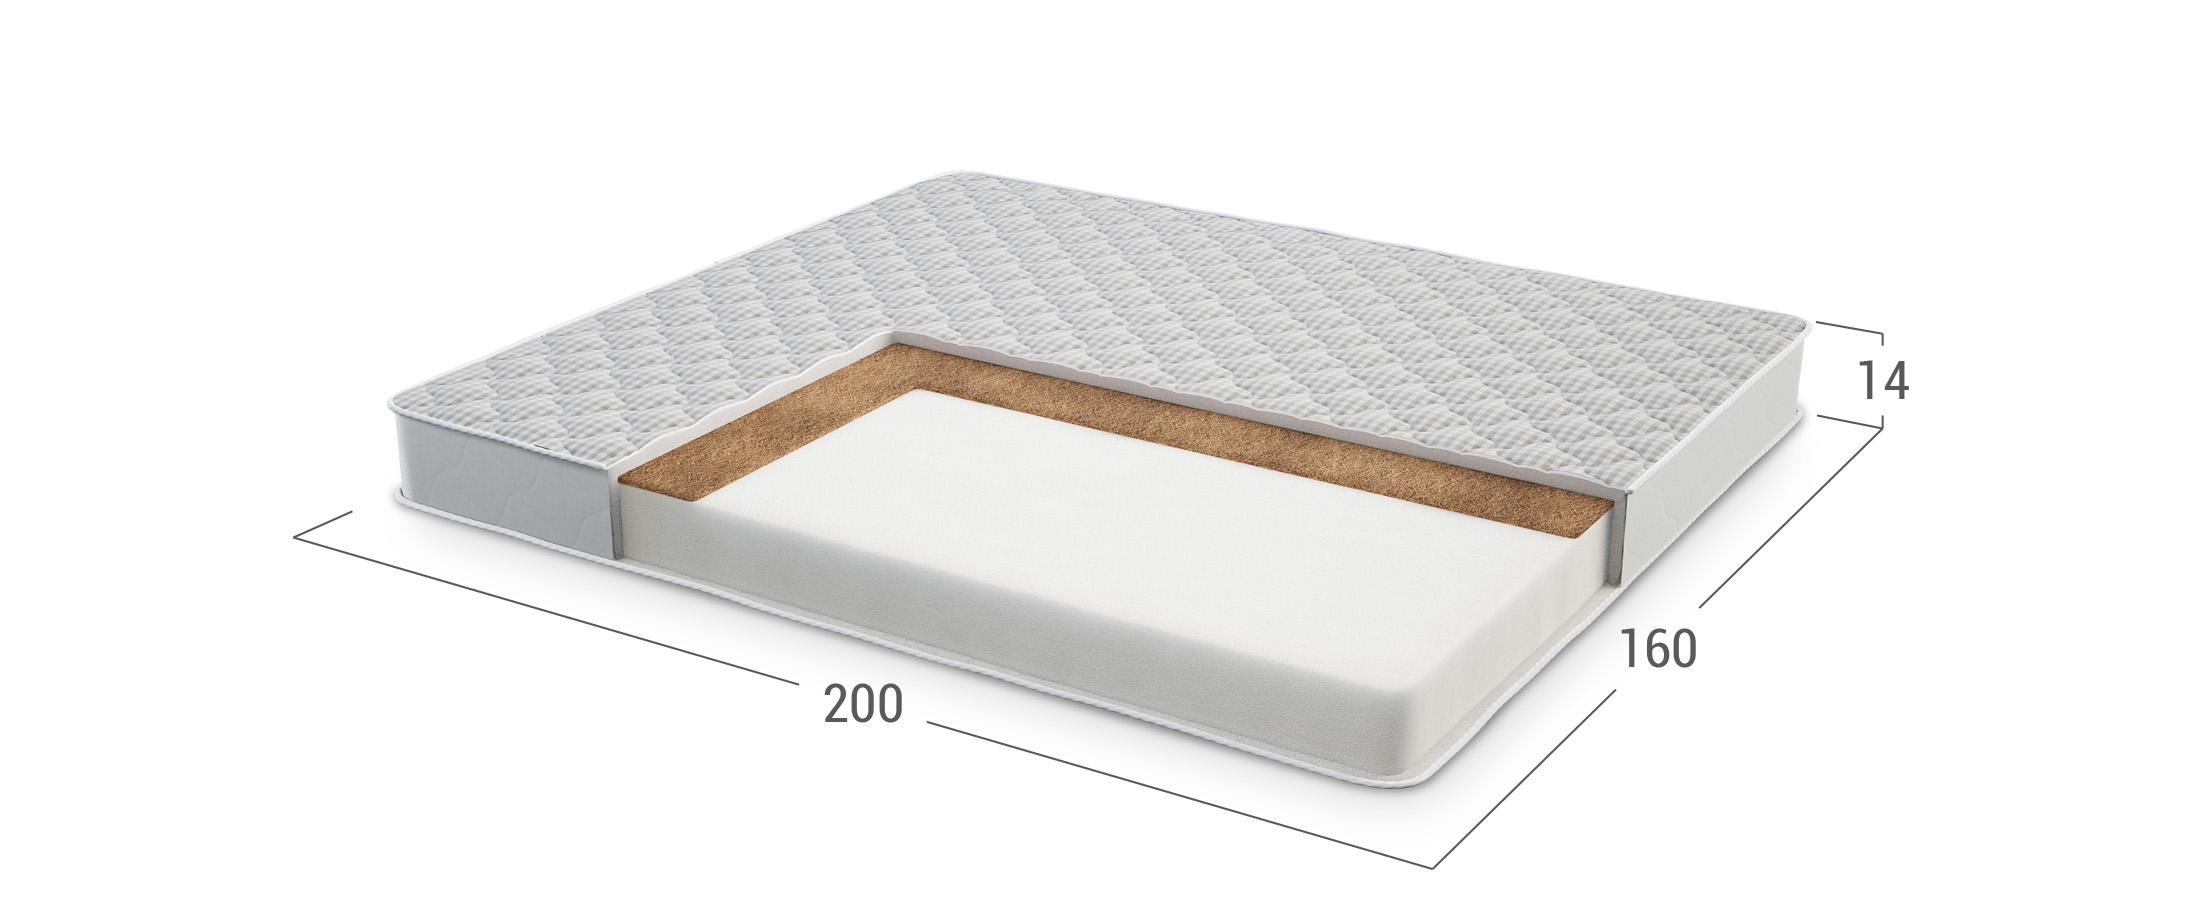 Optimum Flex Coira 428 матрас 160x200